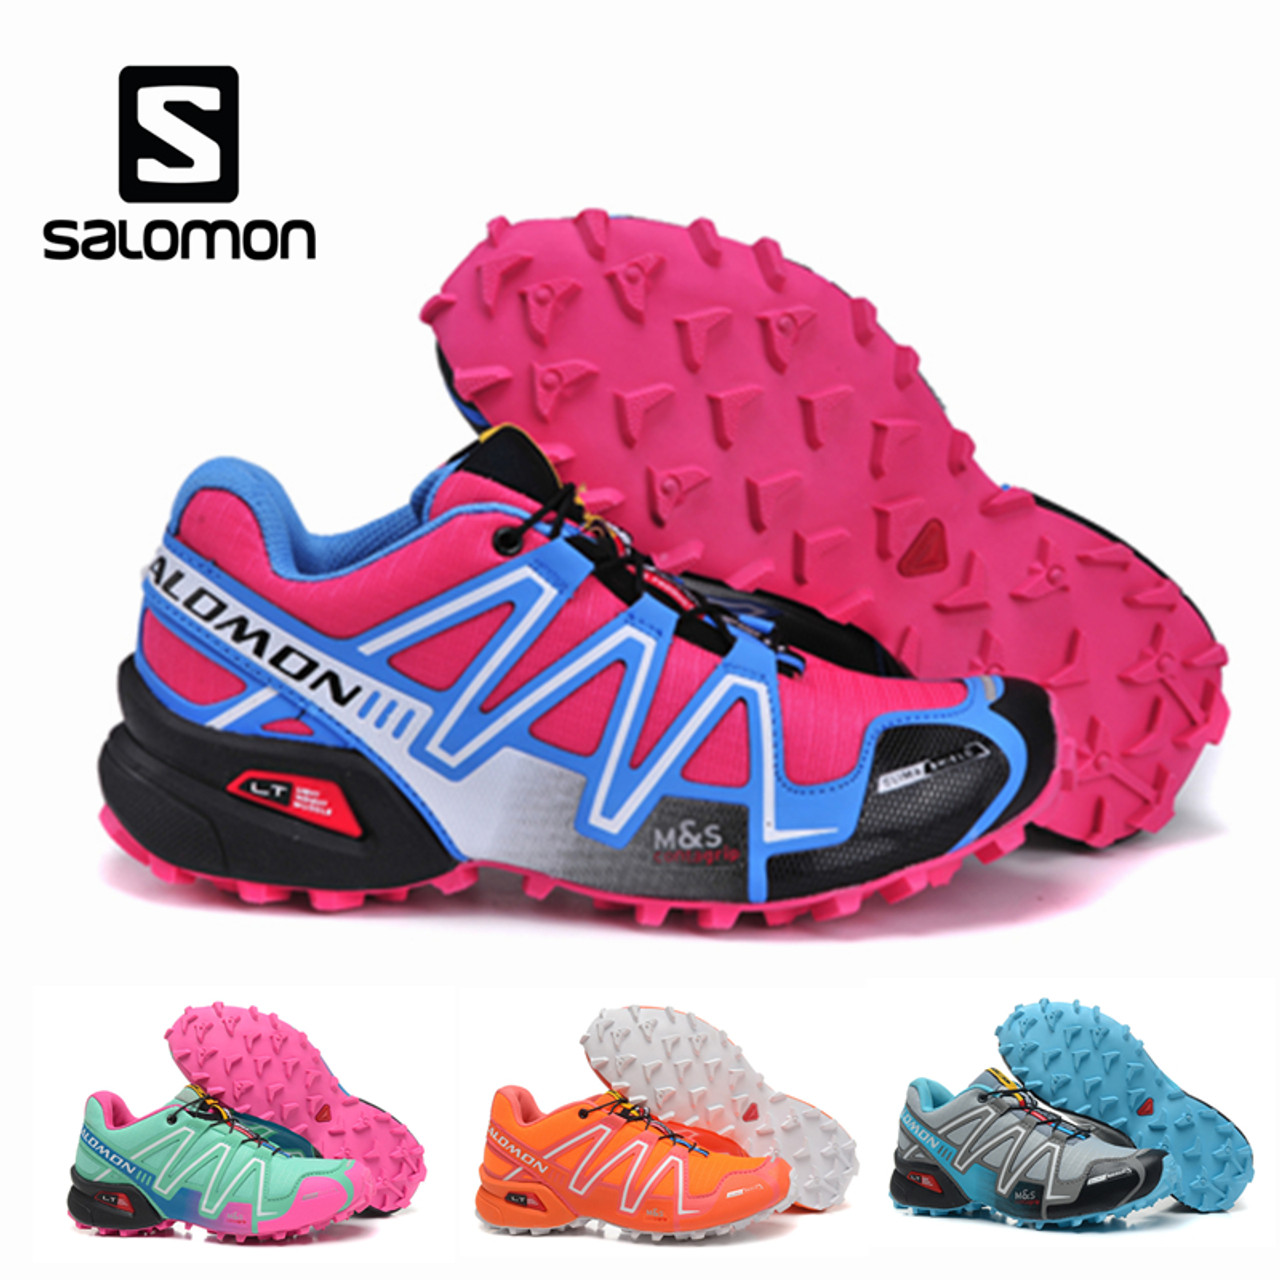 zapatillas salomon speedcross 3 mujer,chaussures running